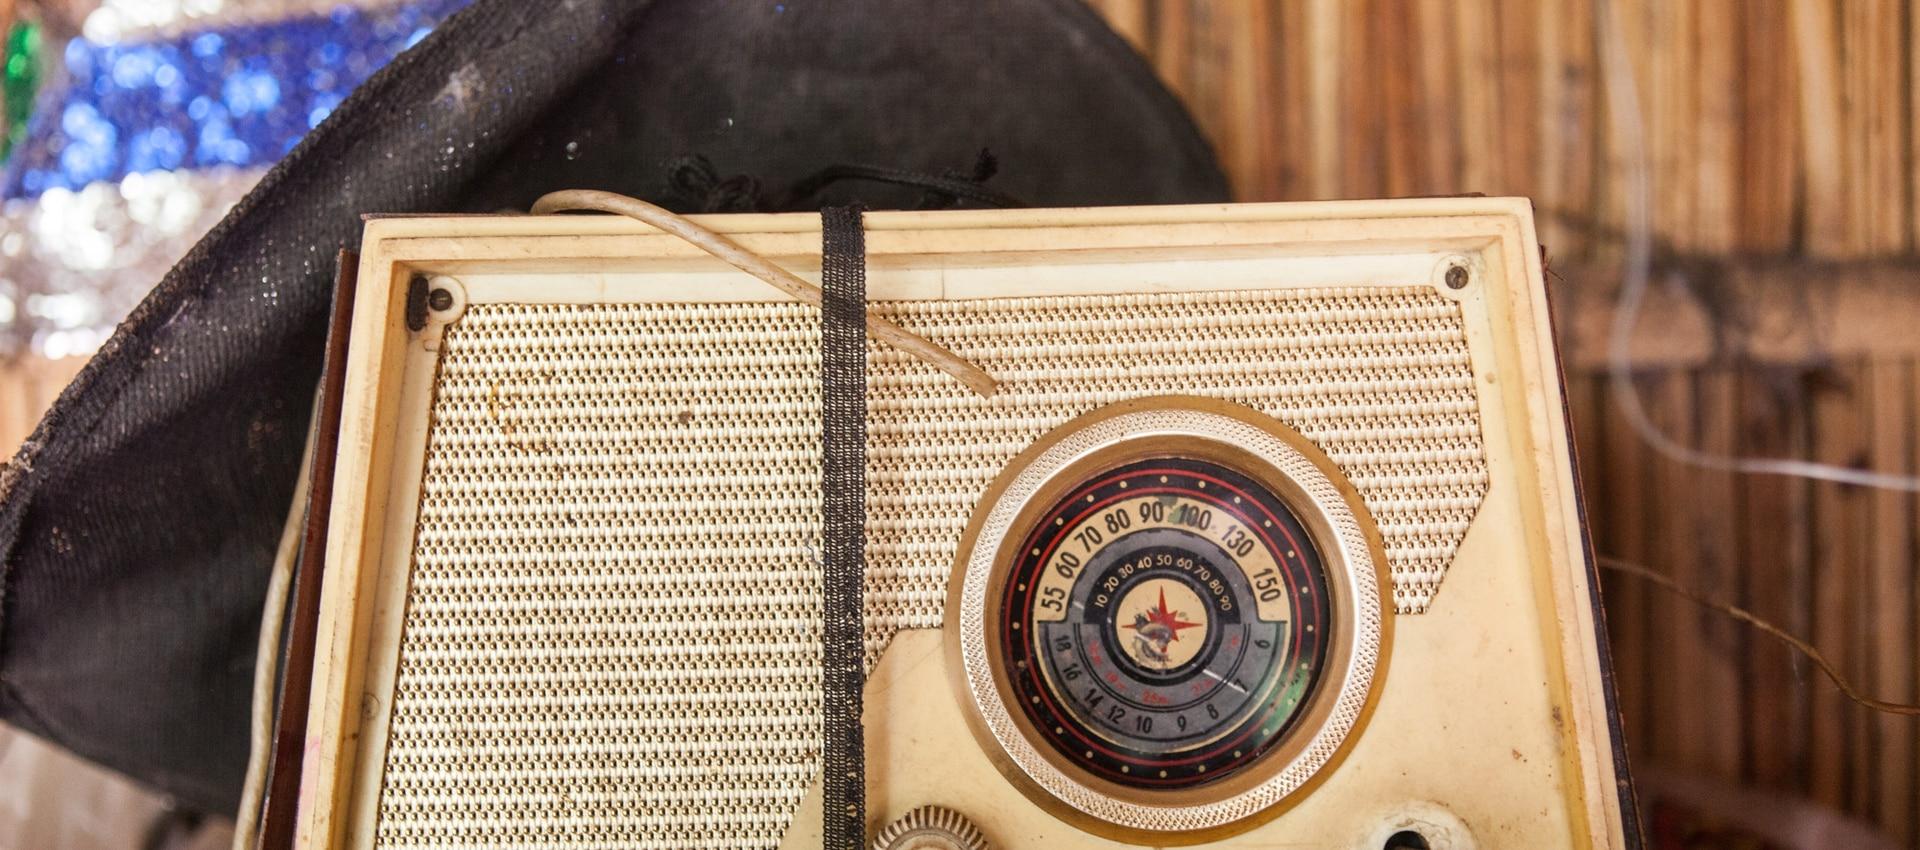 La radio de los Villagra.